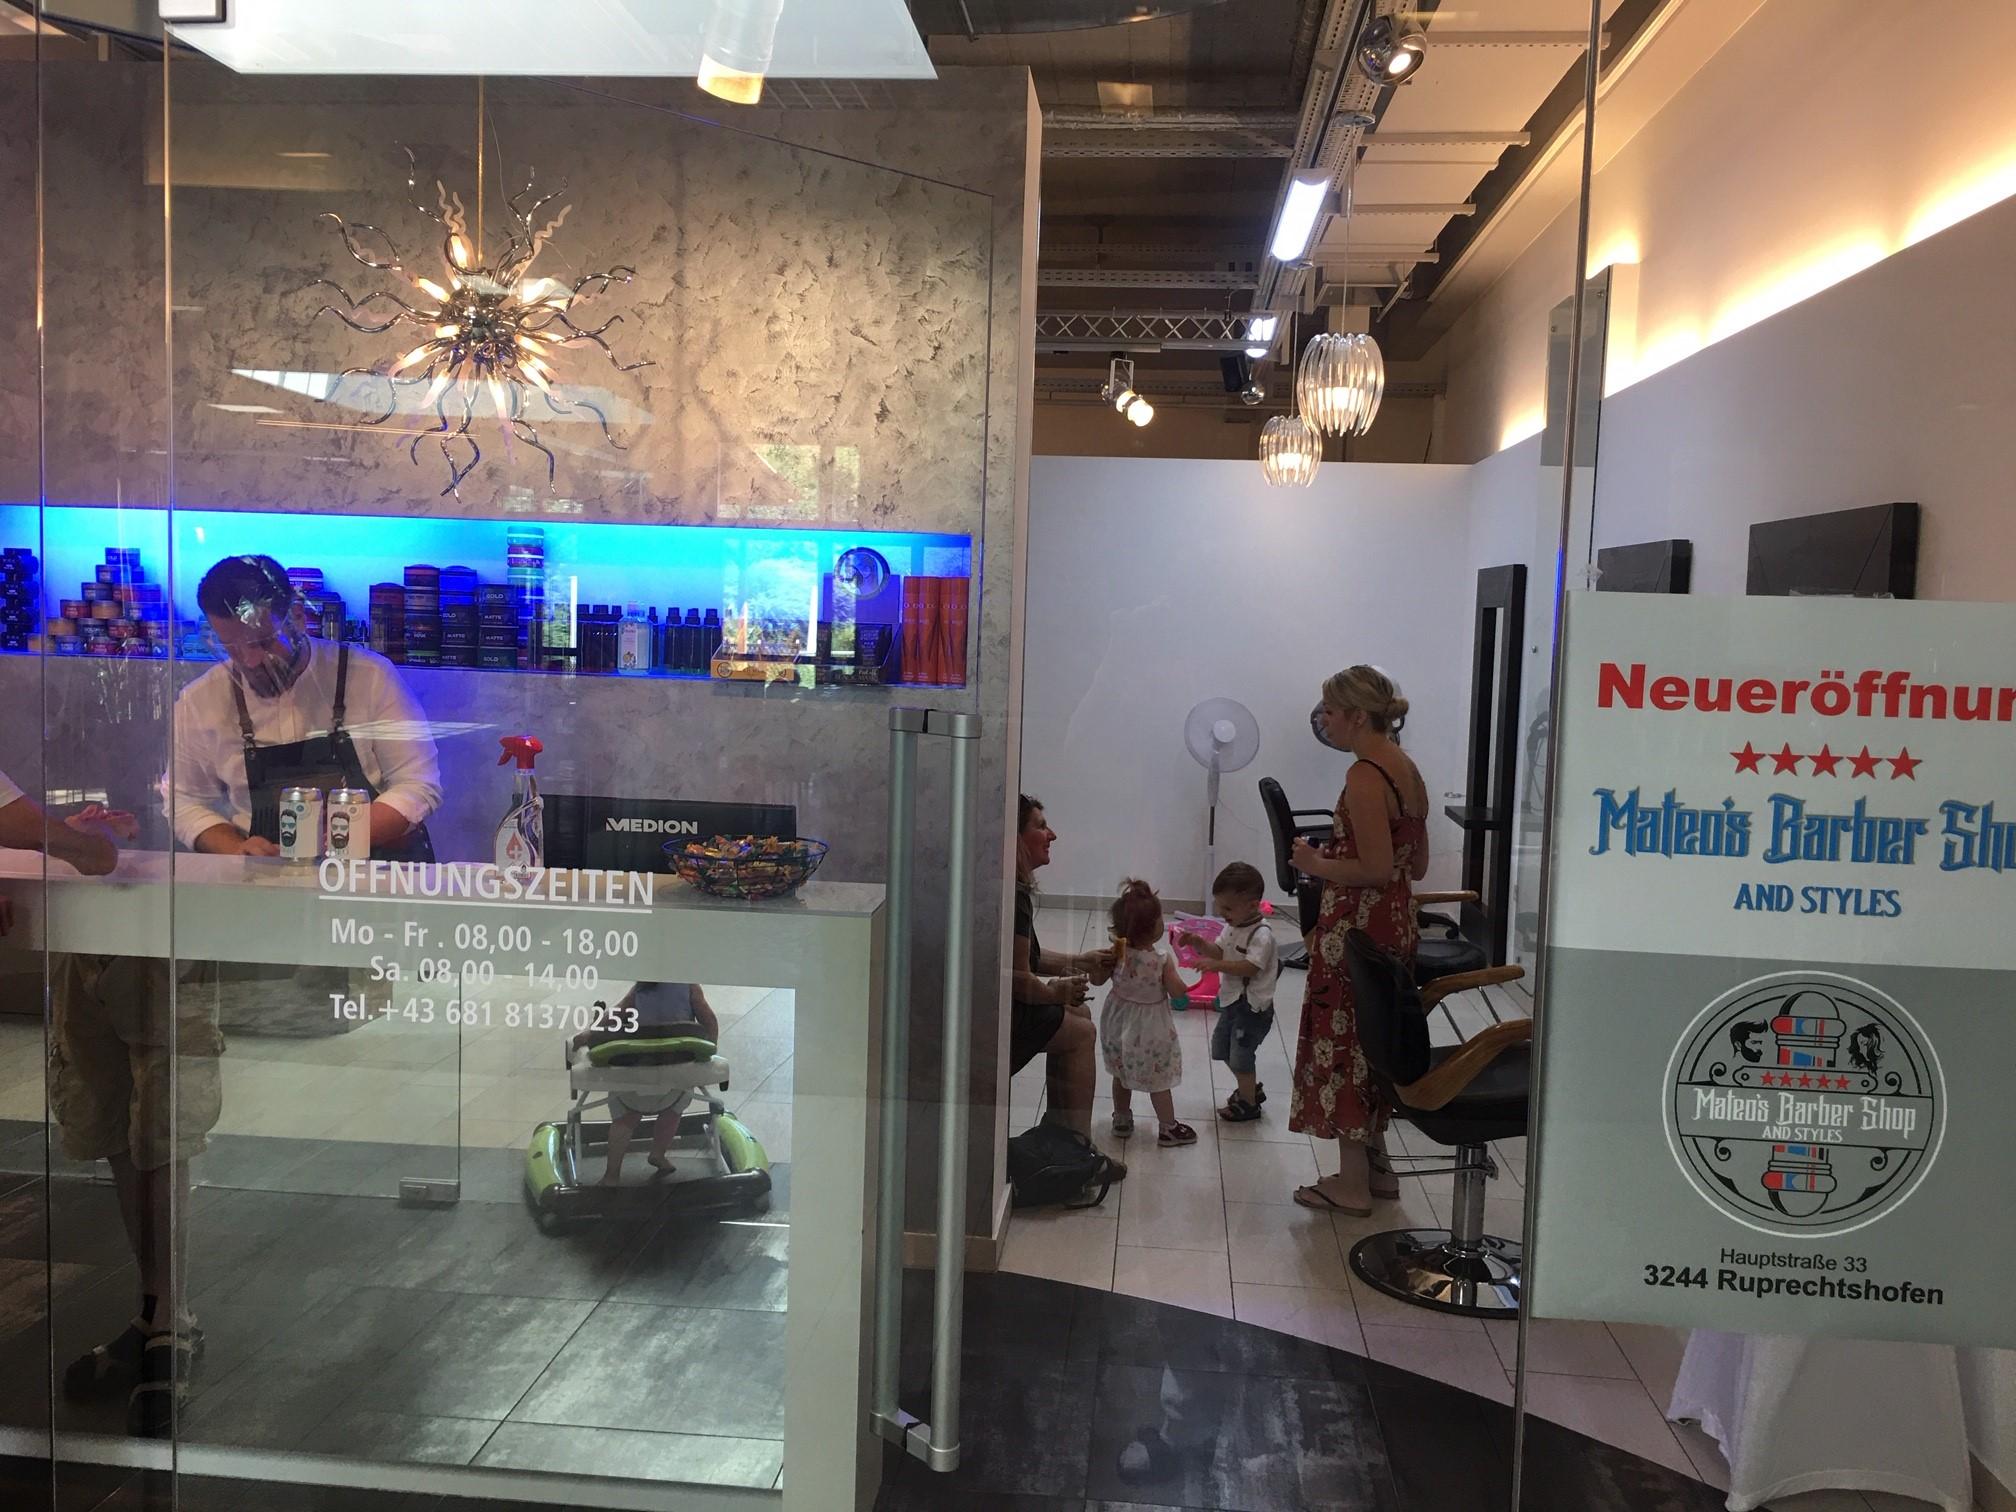 MATEOS Barbershop hat eröffnet